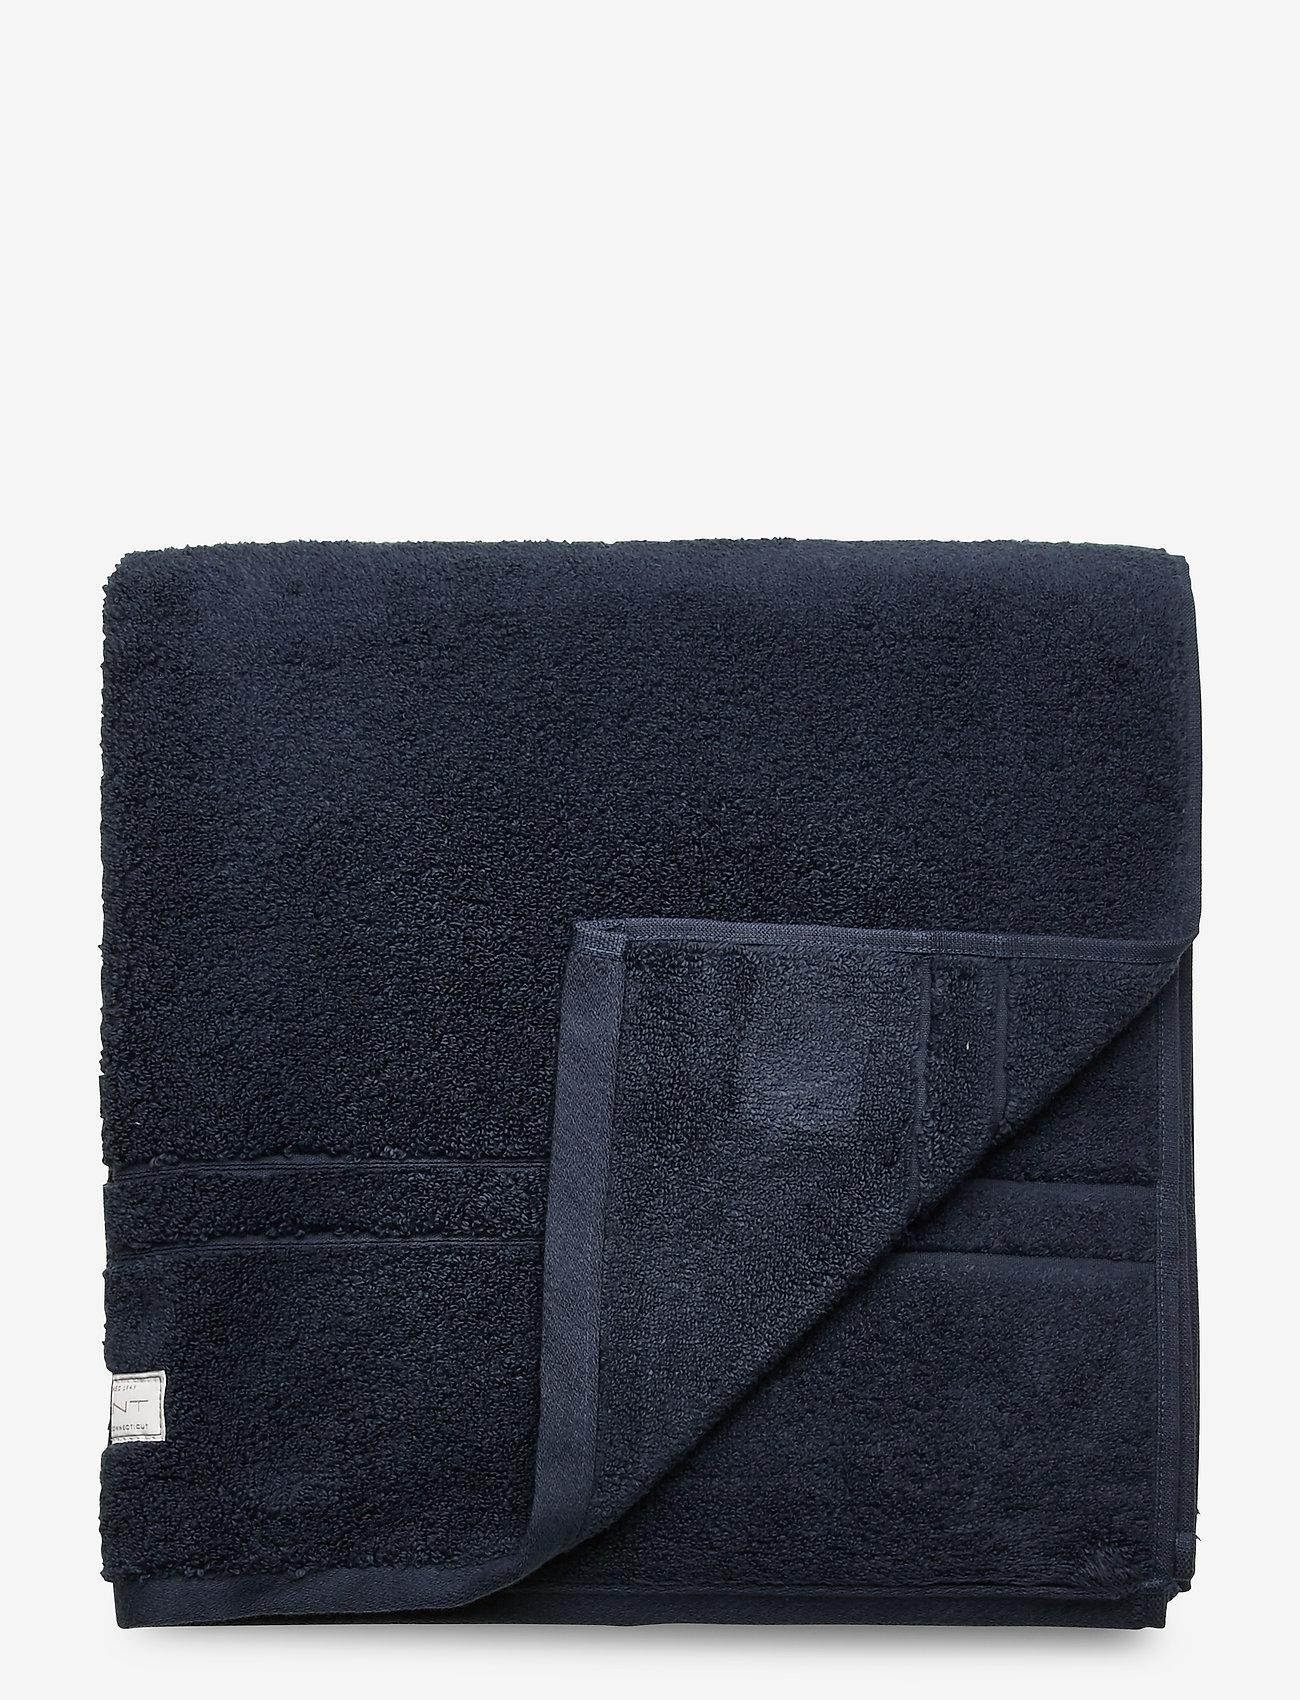 GANT - PREMIUM TOWEL 70X140 - hand towels & bath towels - sateen blue - 0